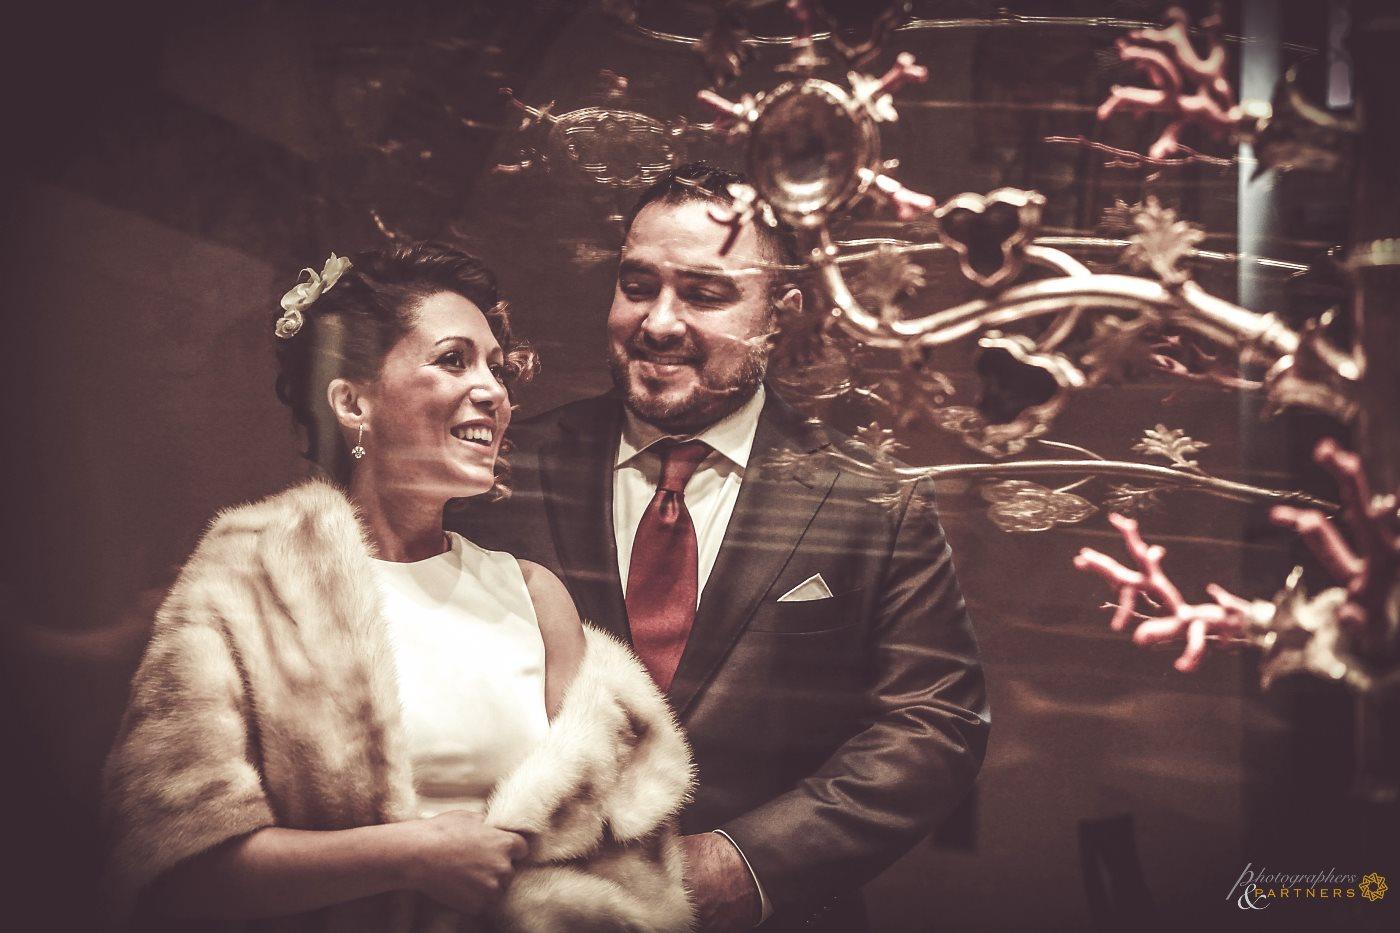 wedding_photographer_lucignano_07.jpg